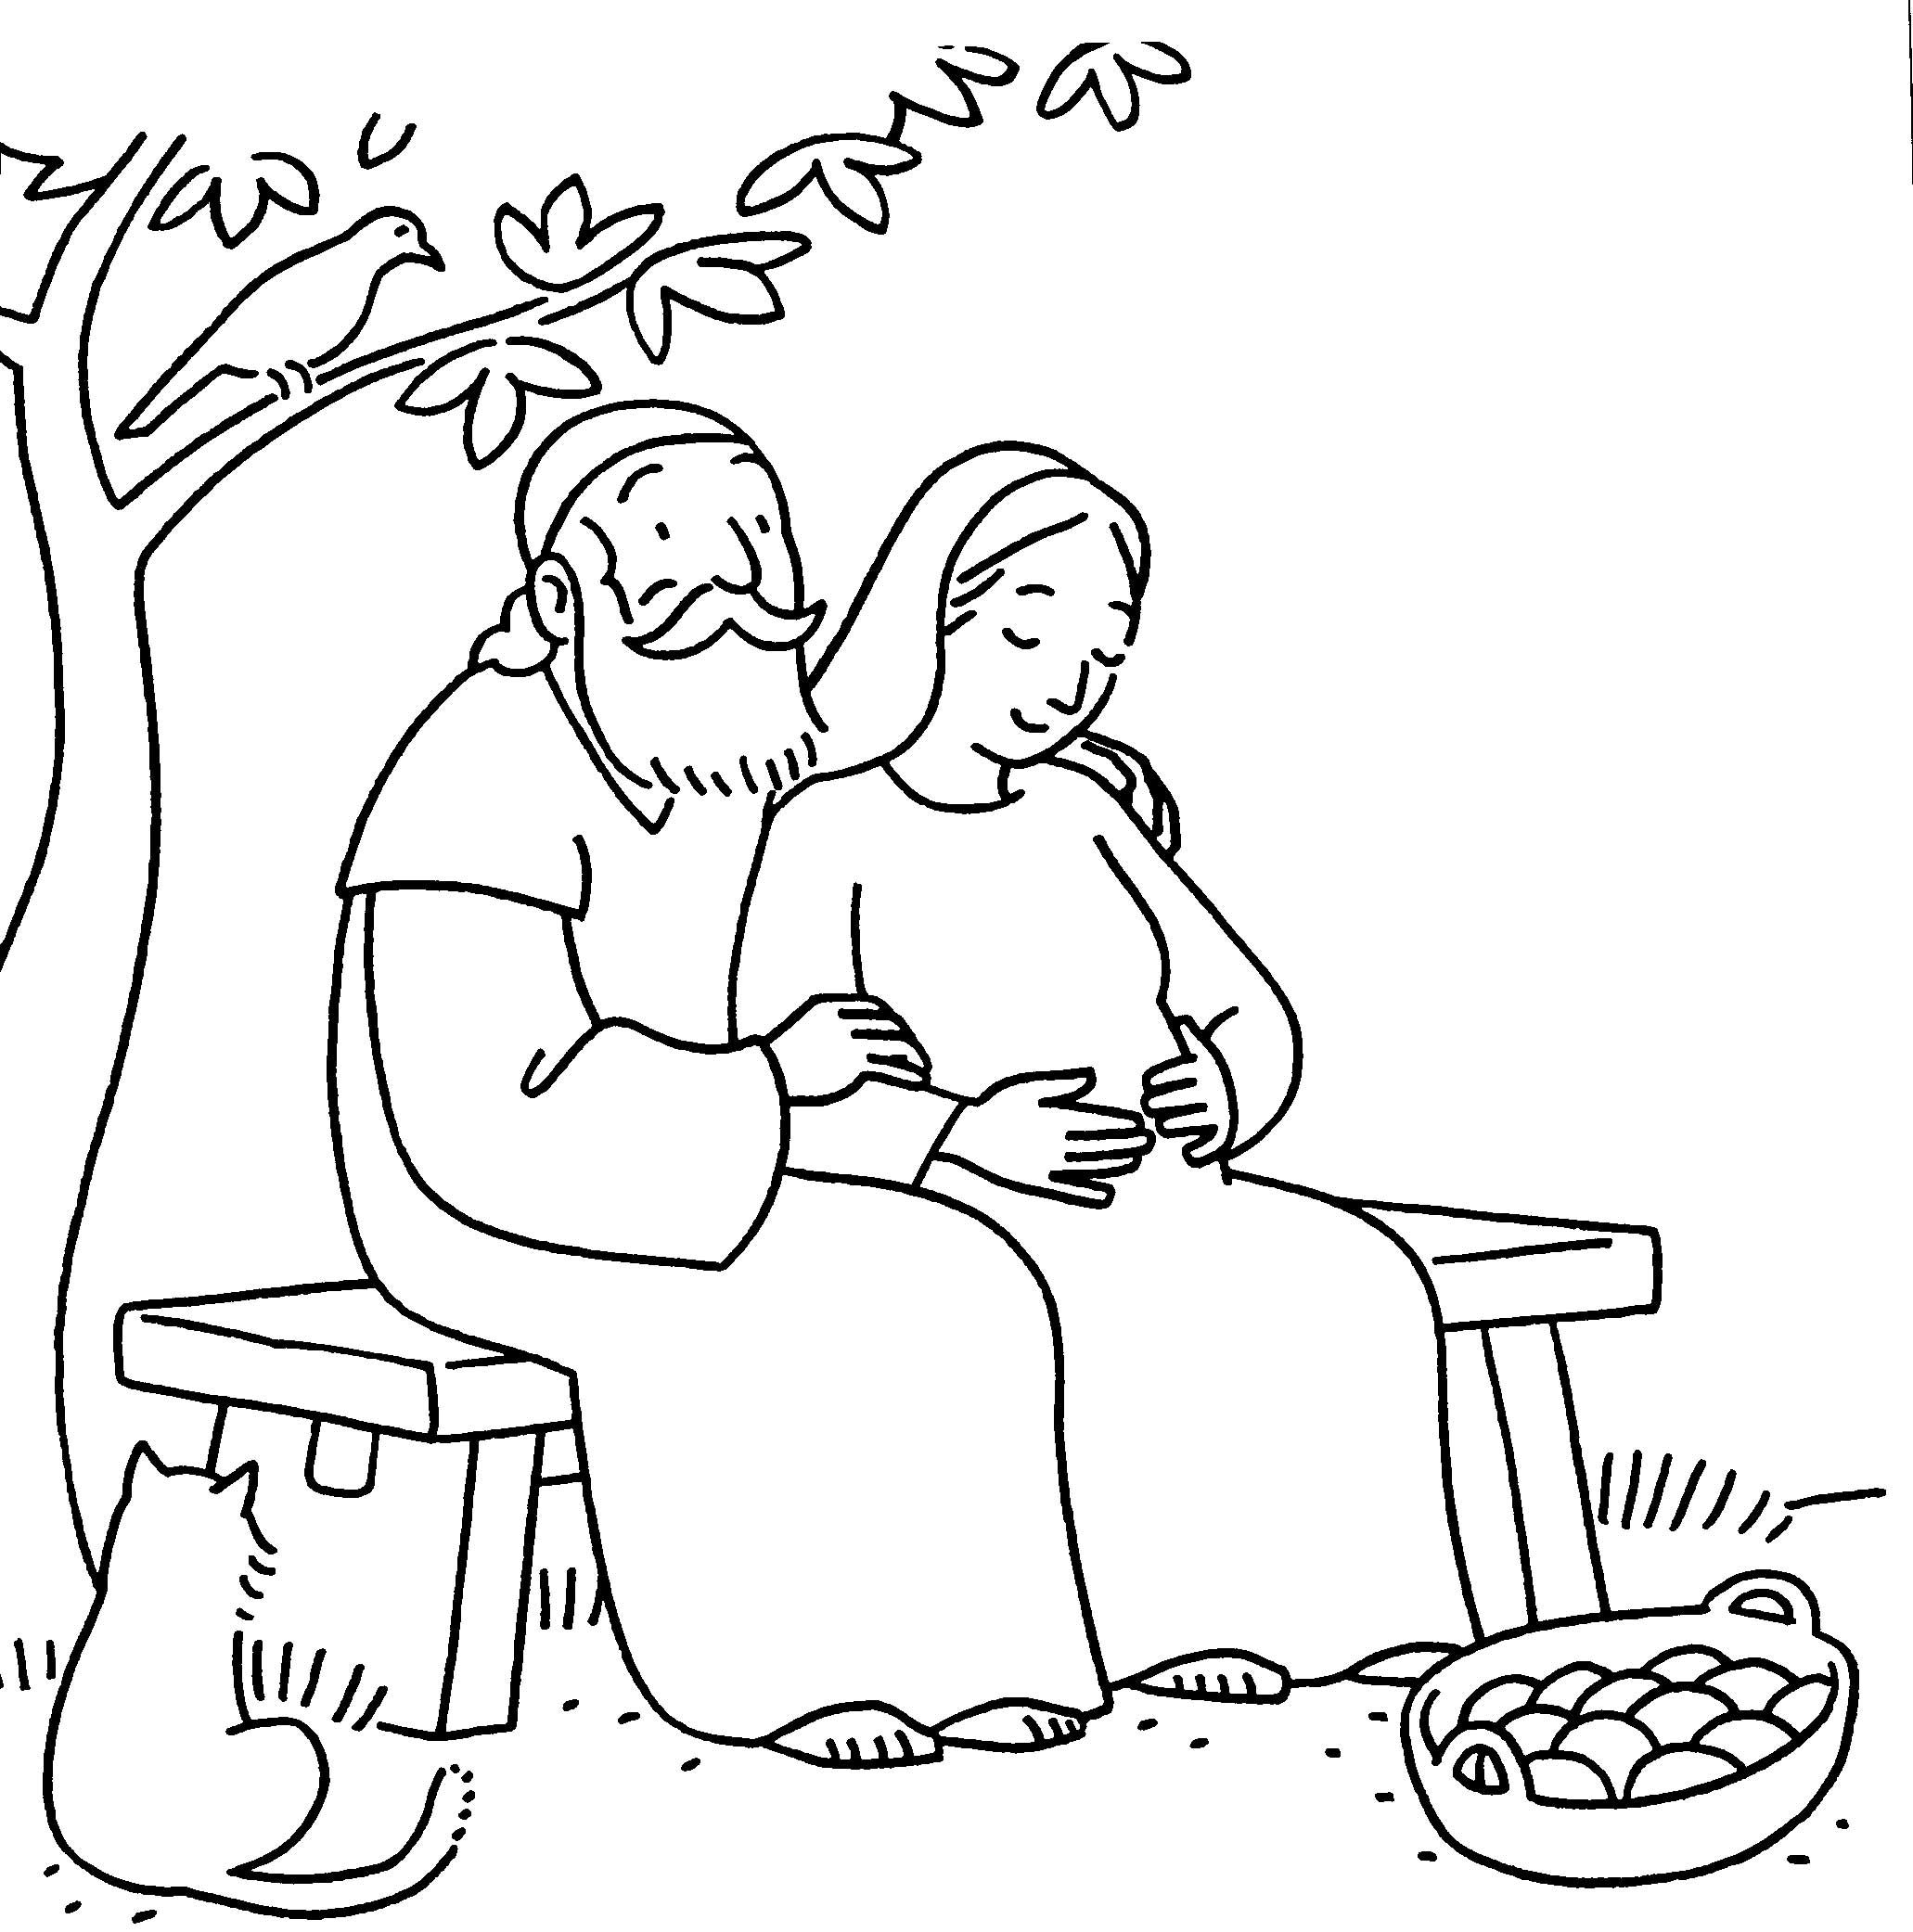 Elizabeth and Zechariah. God's Promises by Sarah Michael